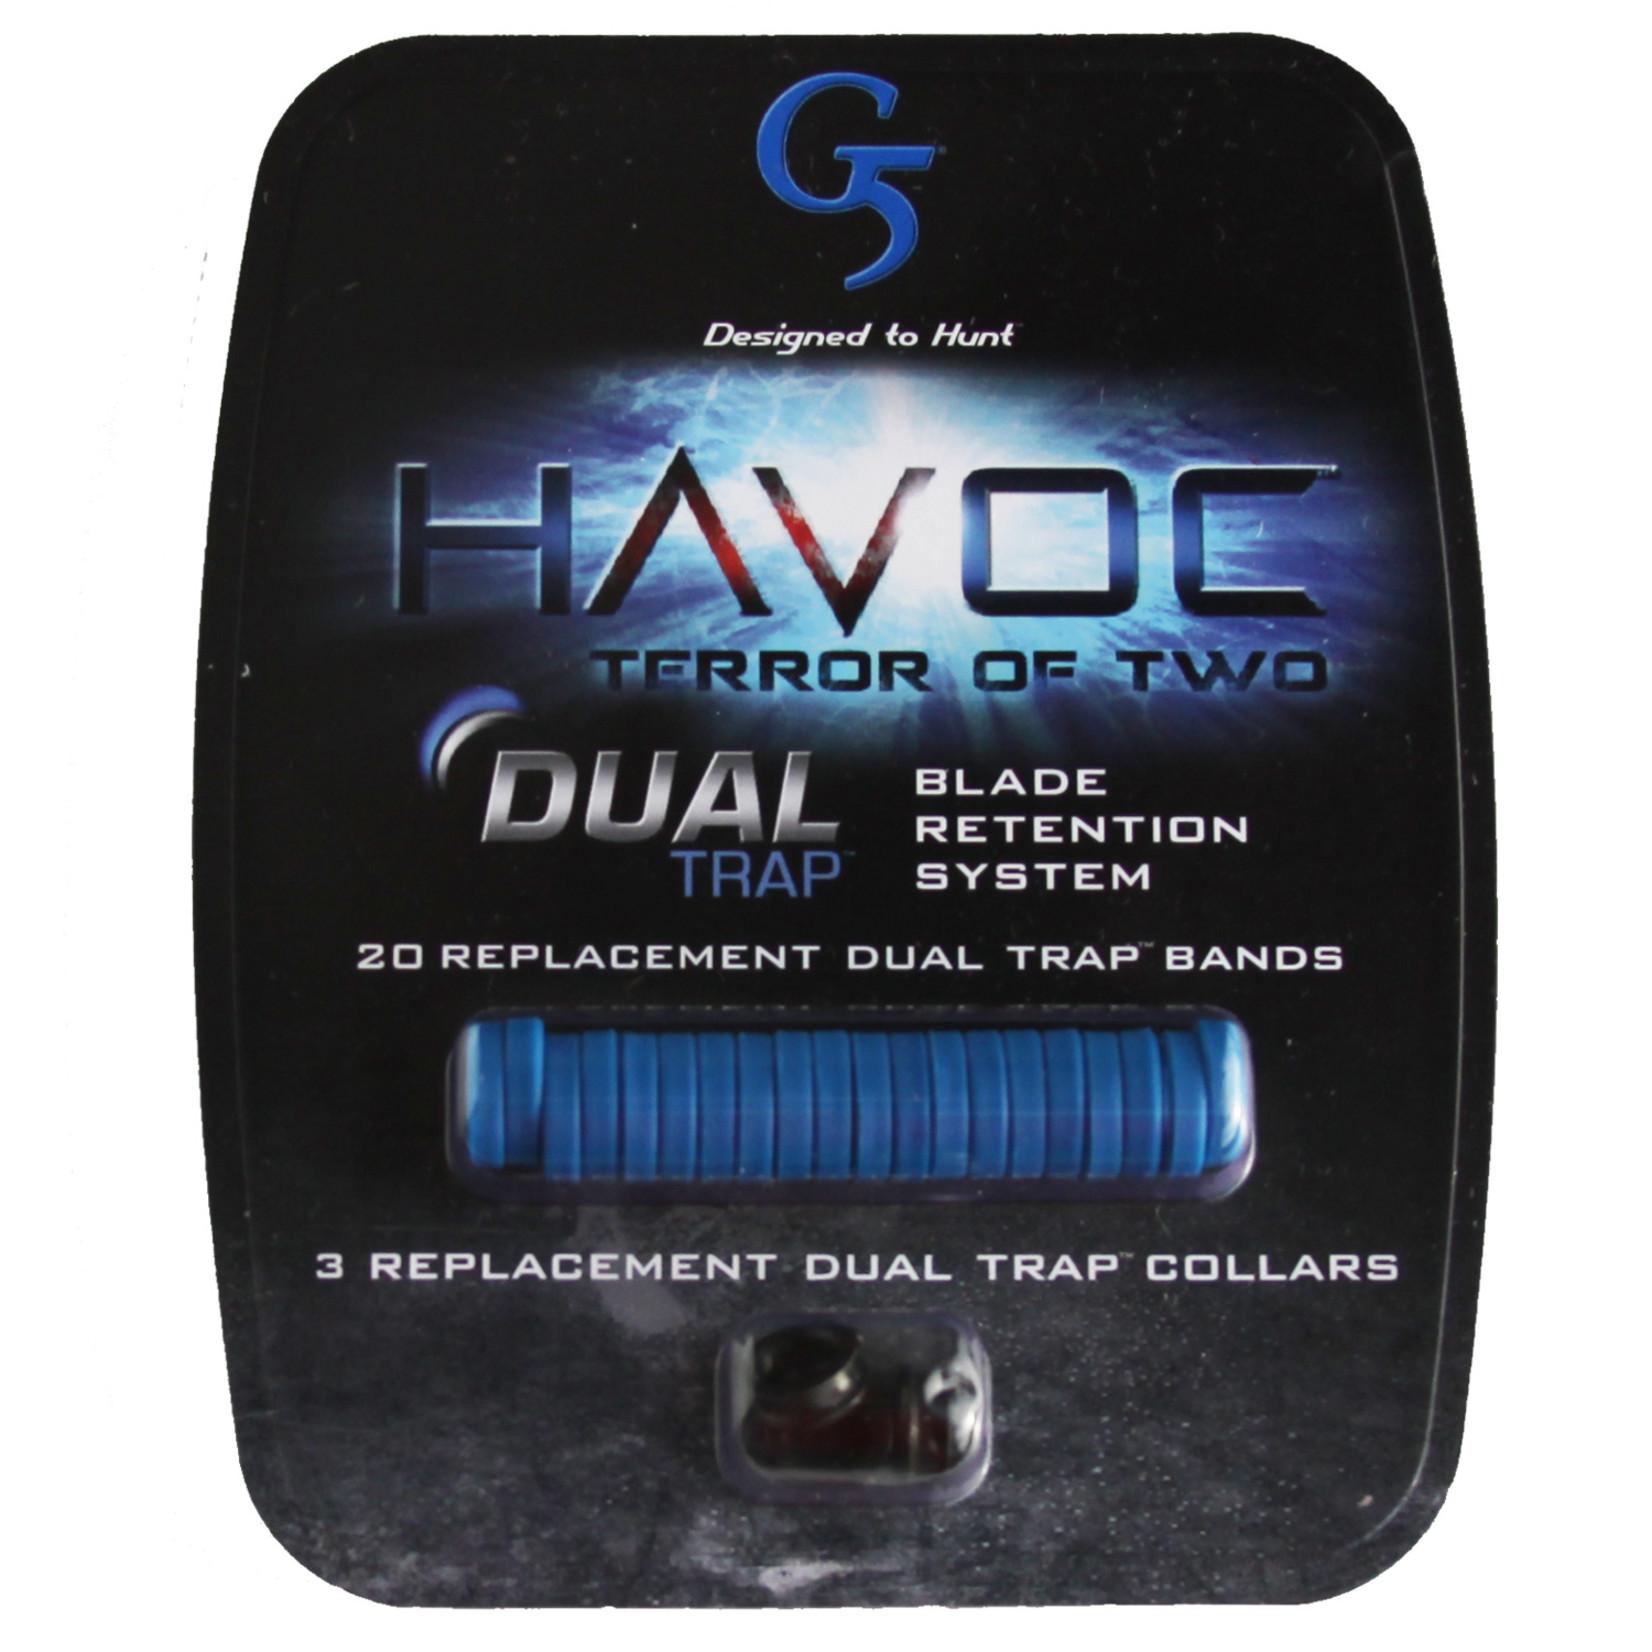 947 Havoc Replacement